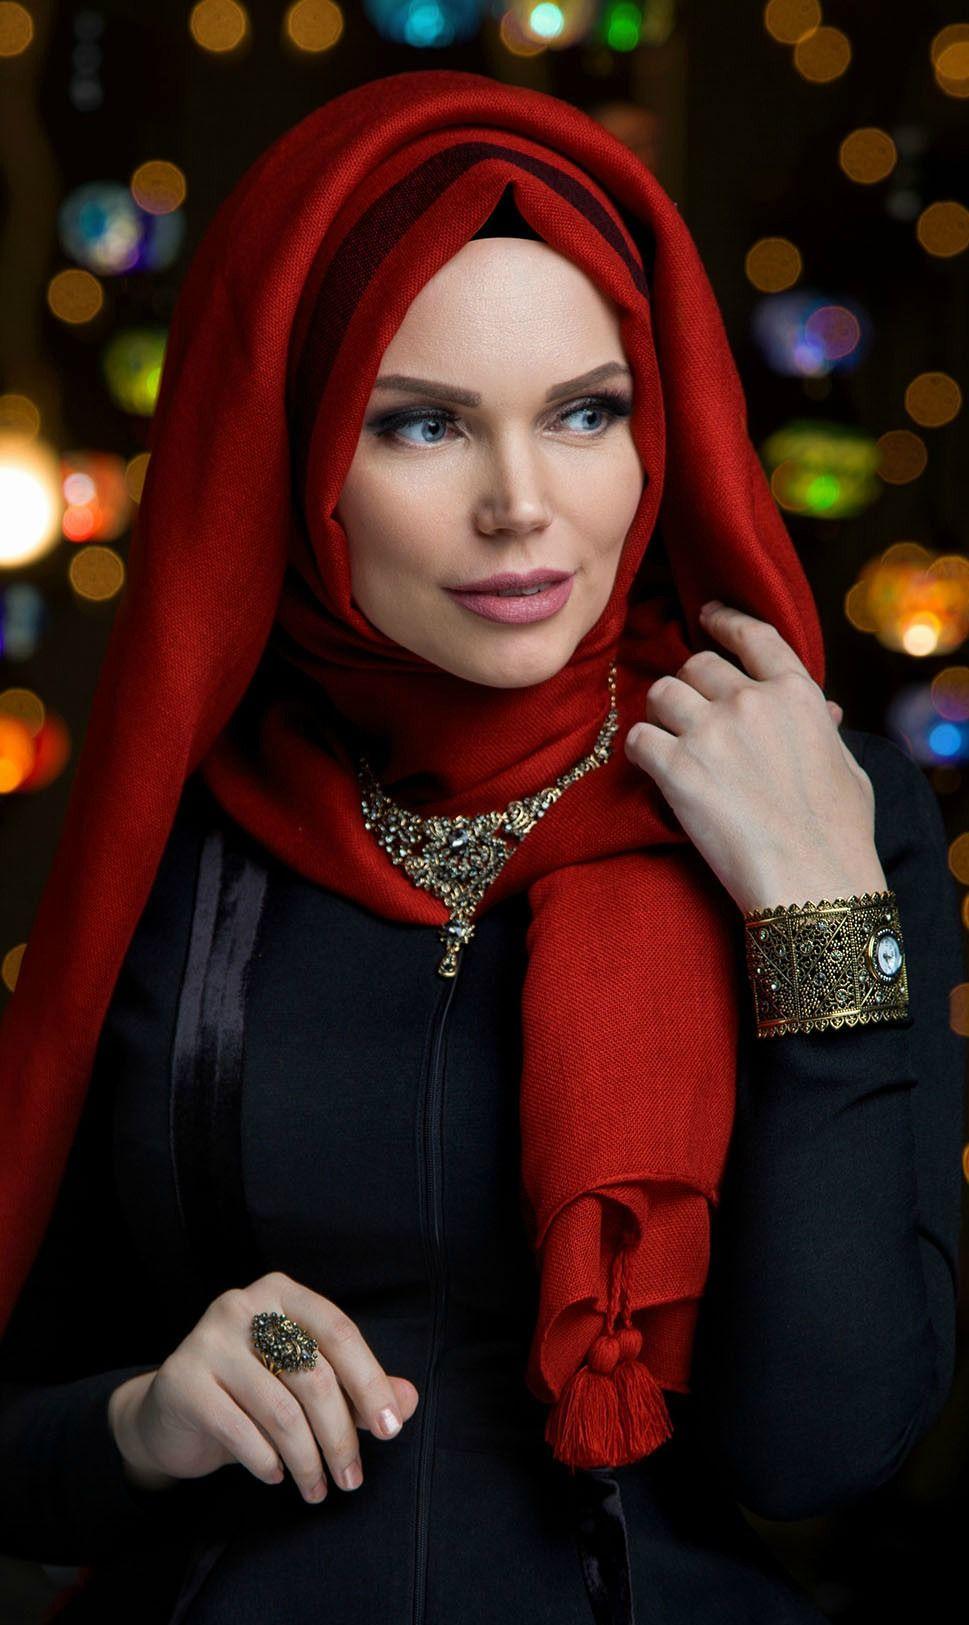 Muslima Wear Queen Hijab Terracotta   Giyim, Kıyafet, Trendler